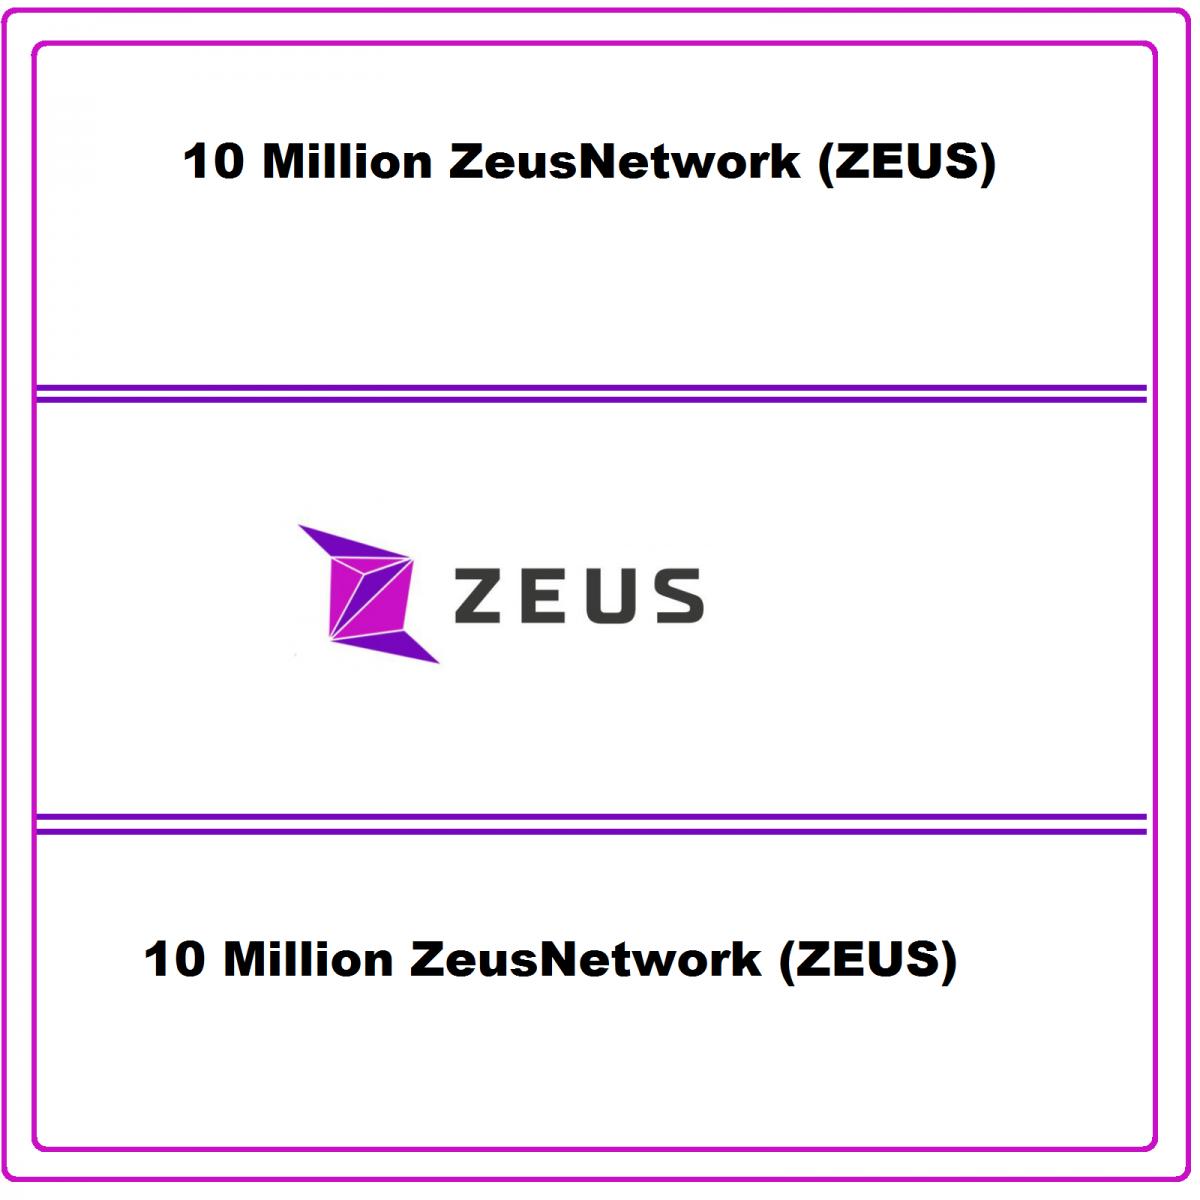 Zeus Network 10 Million ZEUS